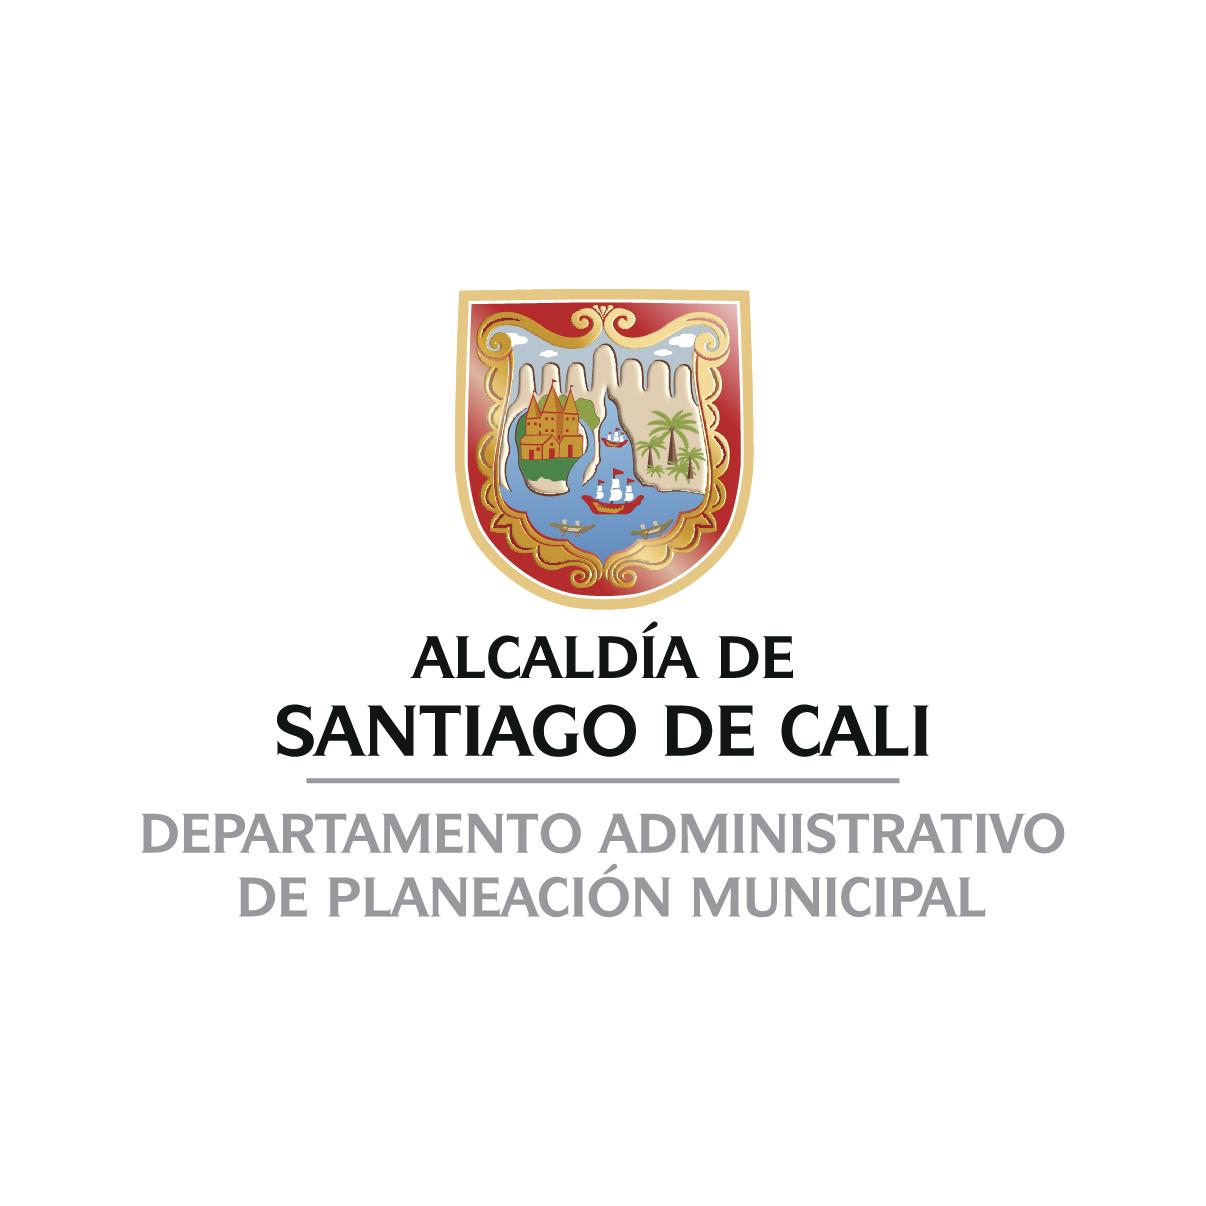 departamento-administrativo-de-planeacion-municipal